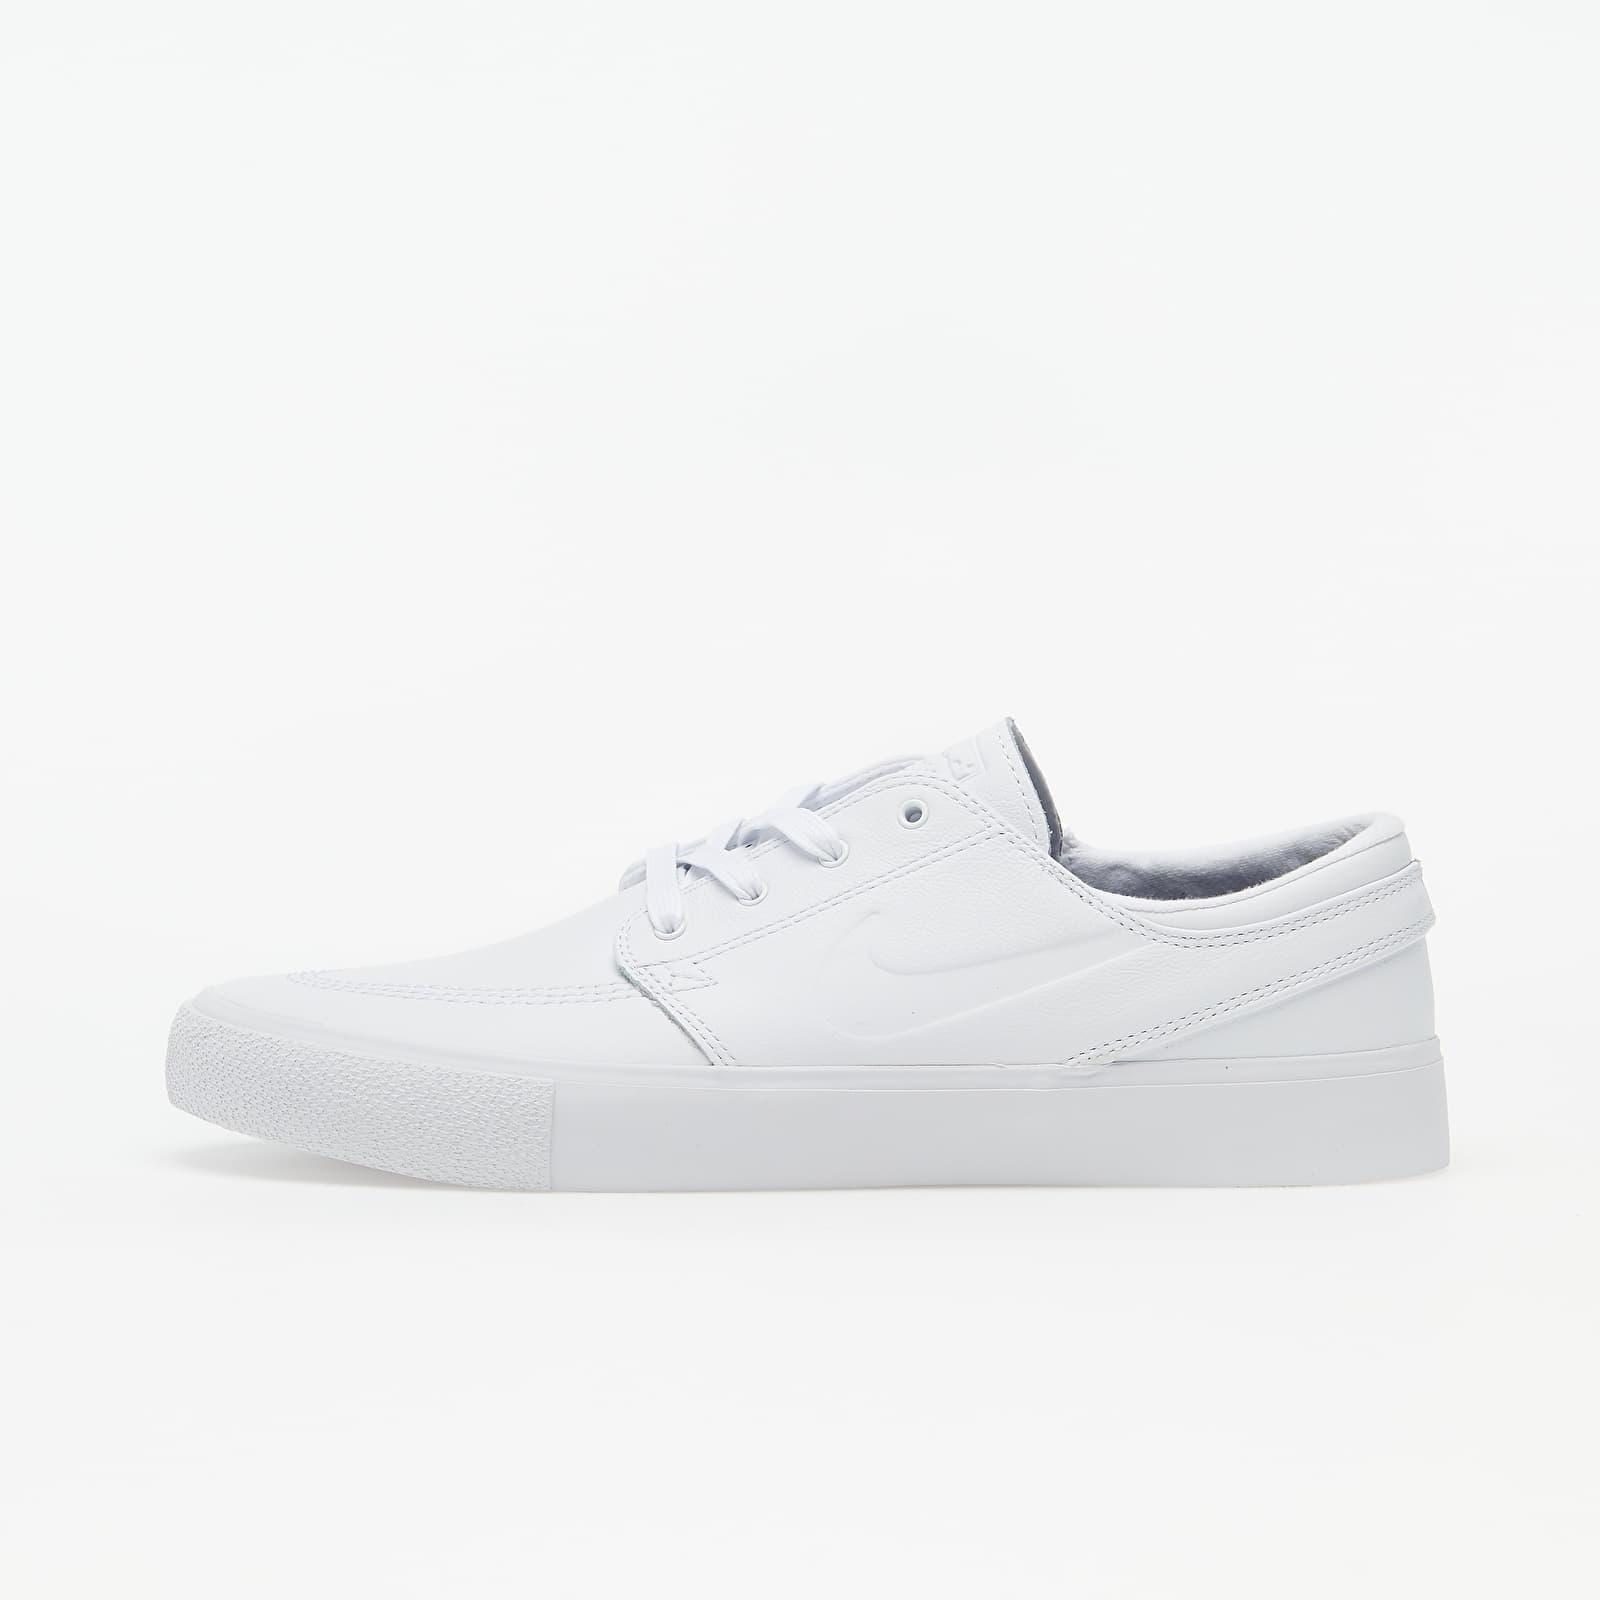 Oblicuo recompensa revolución  Men's shoes Nike SB Zoom Stefan Janoski RM Premium White/ White-White    Footshop